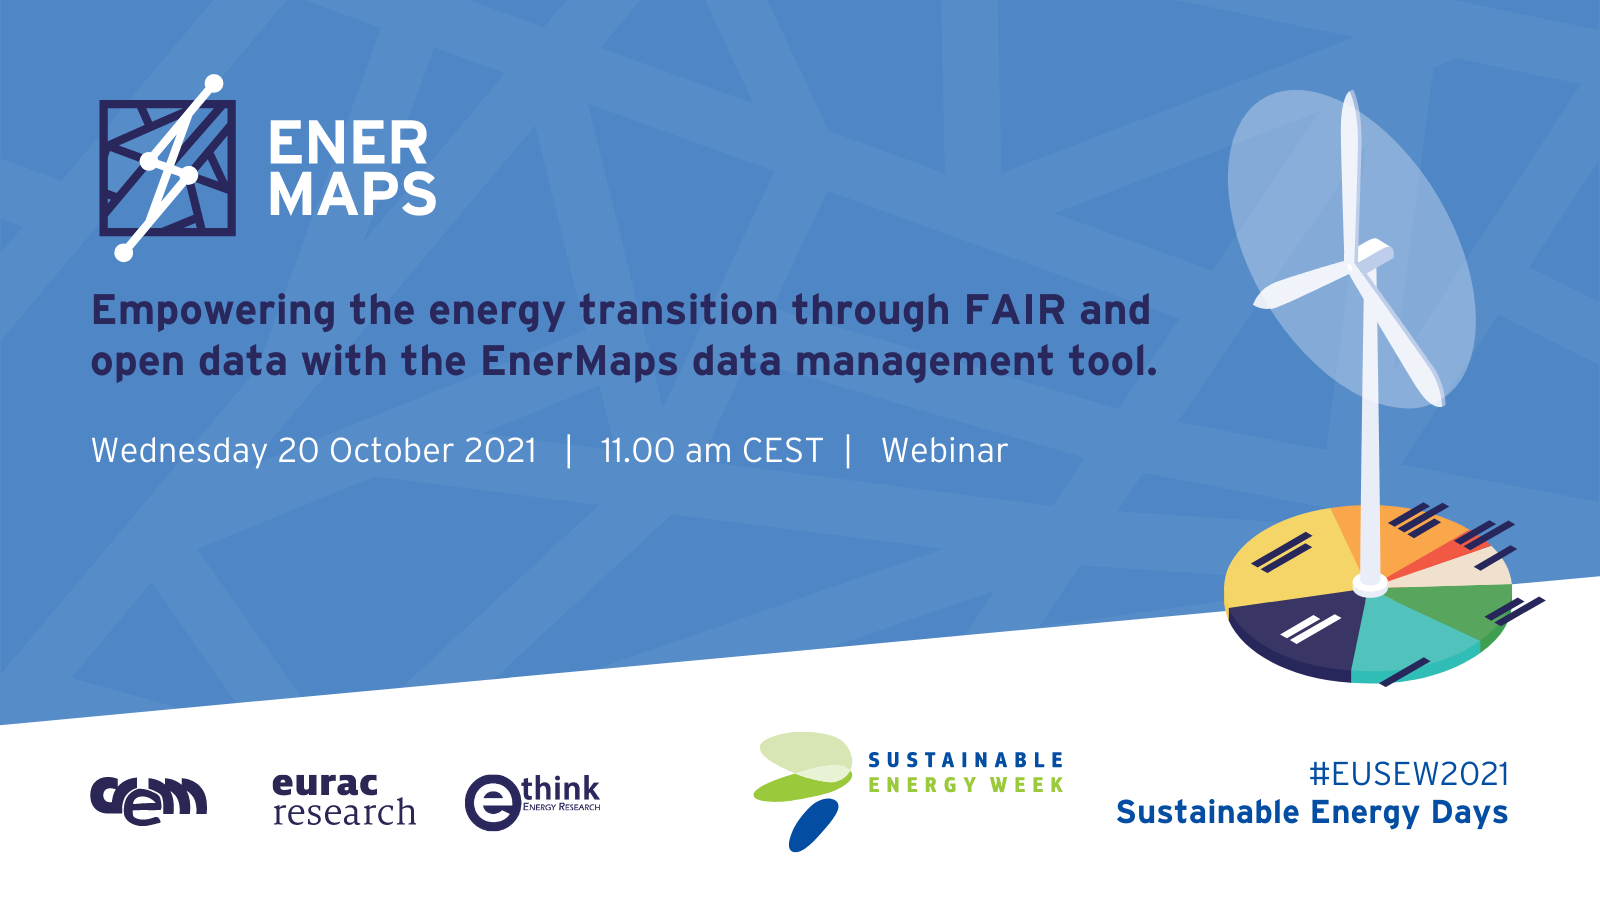 EUSEW 2021 | Sustainable Energy Days